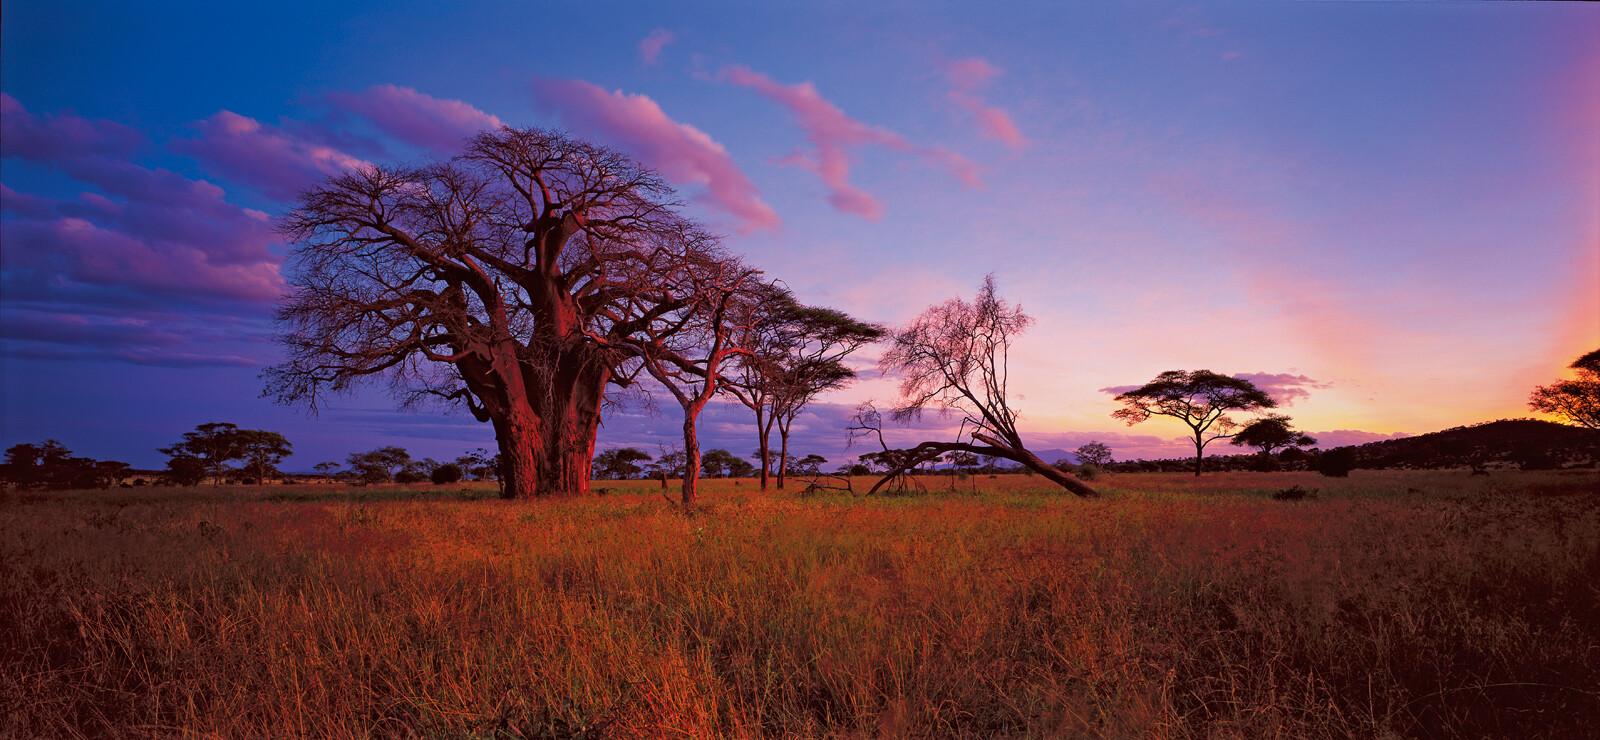 Baobab Tarangire National park, Tanzania - Horst Klemm